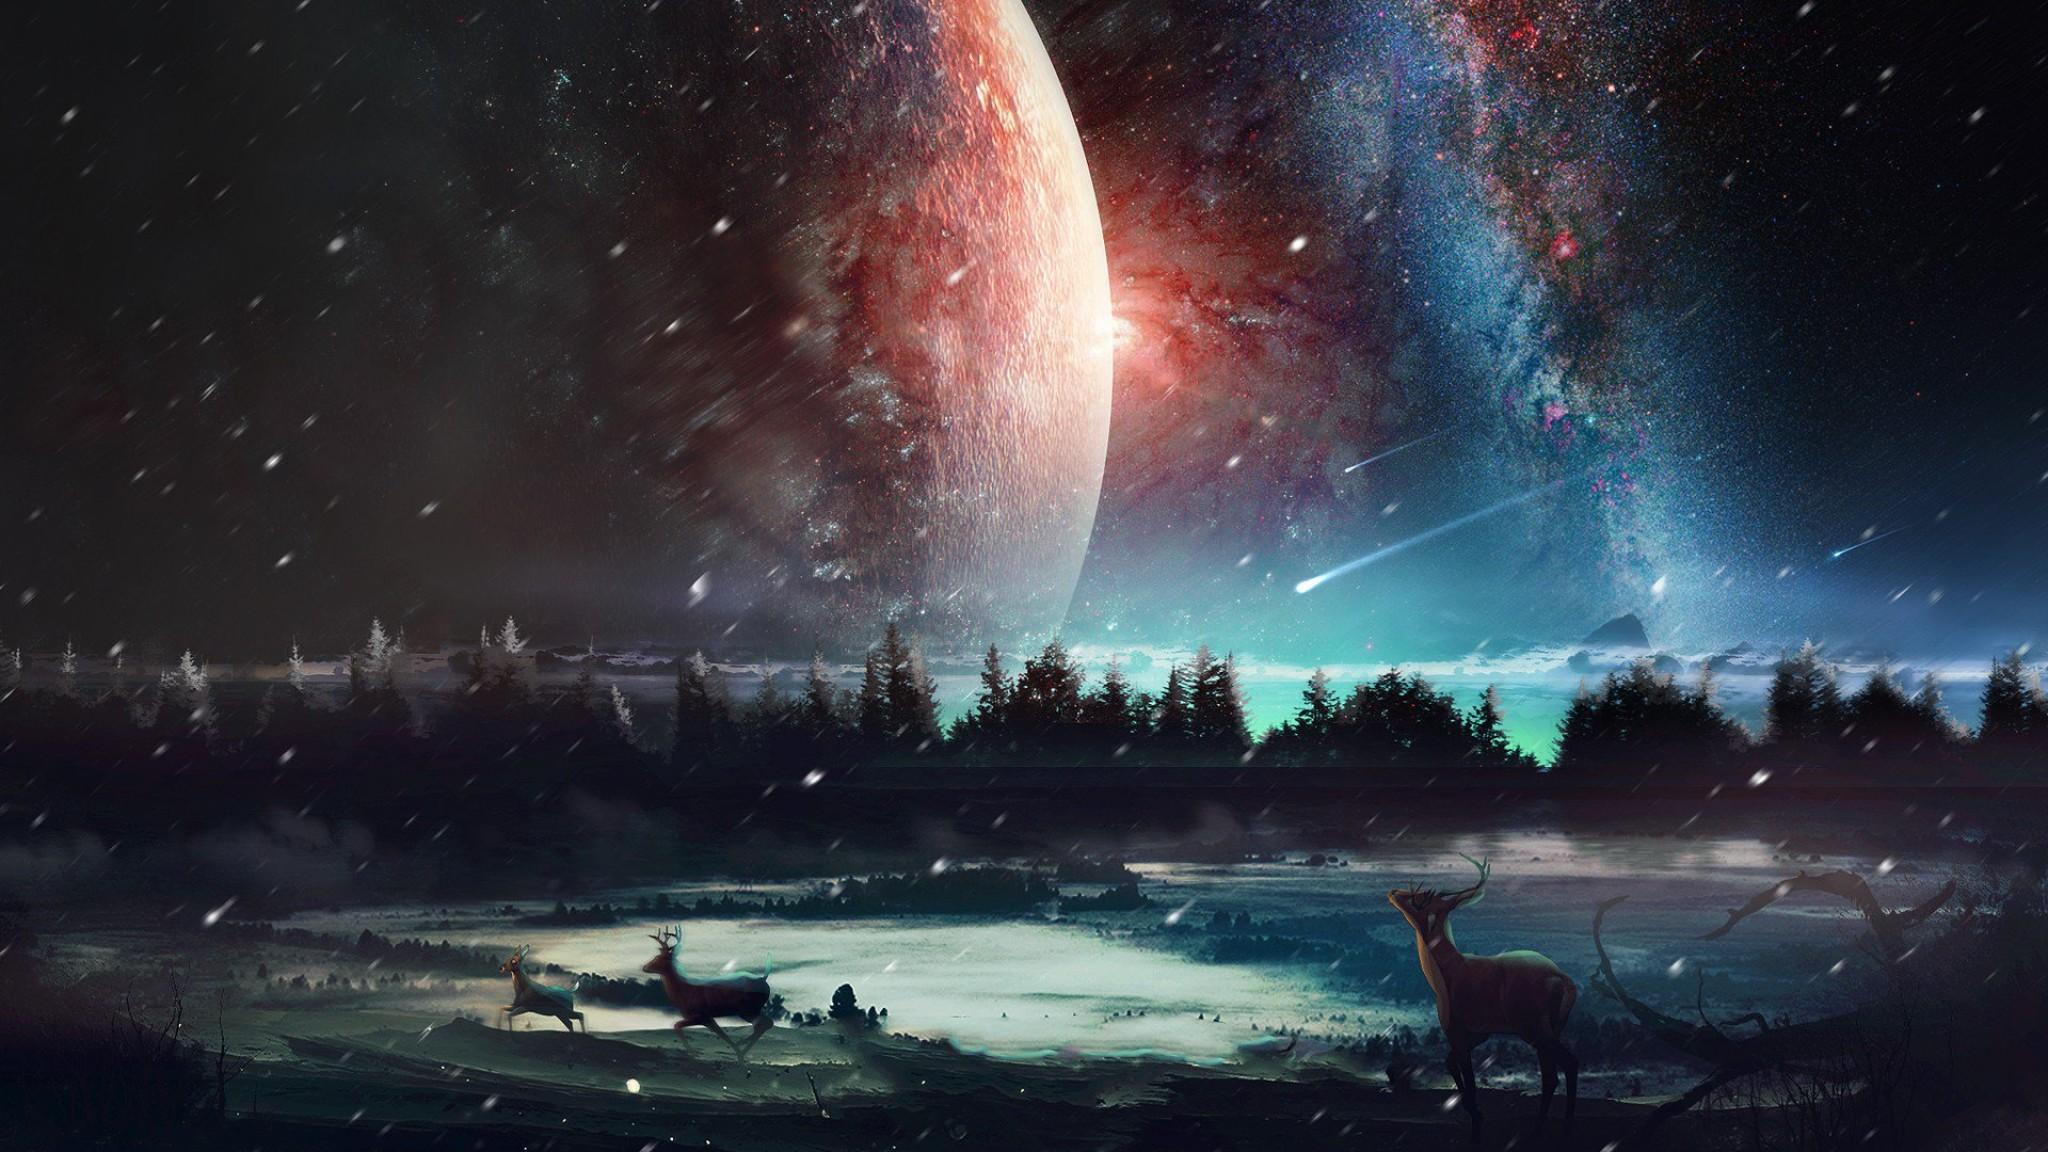 universe wallpaper 4k,sky,nature,atmosphere,aurora,space